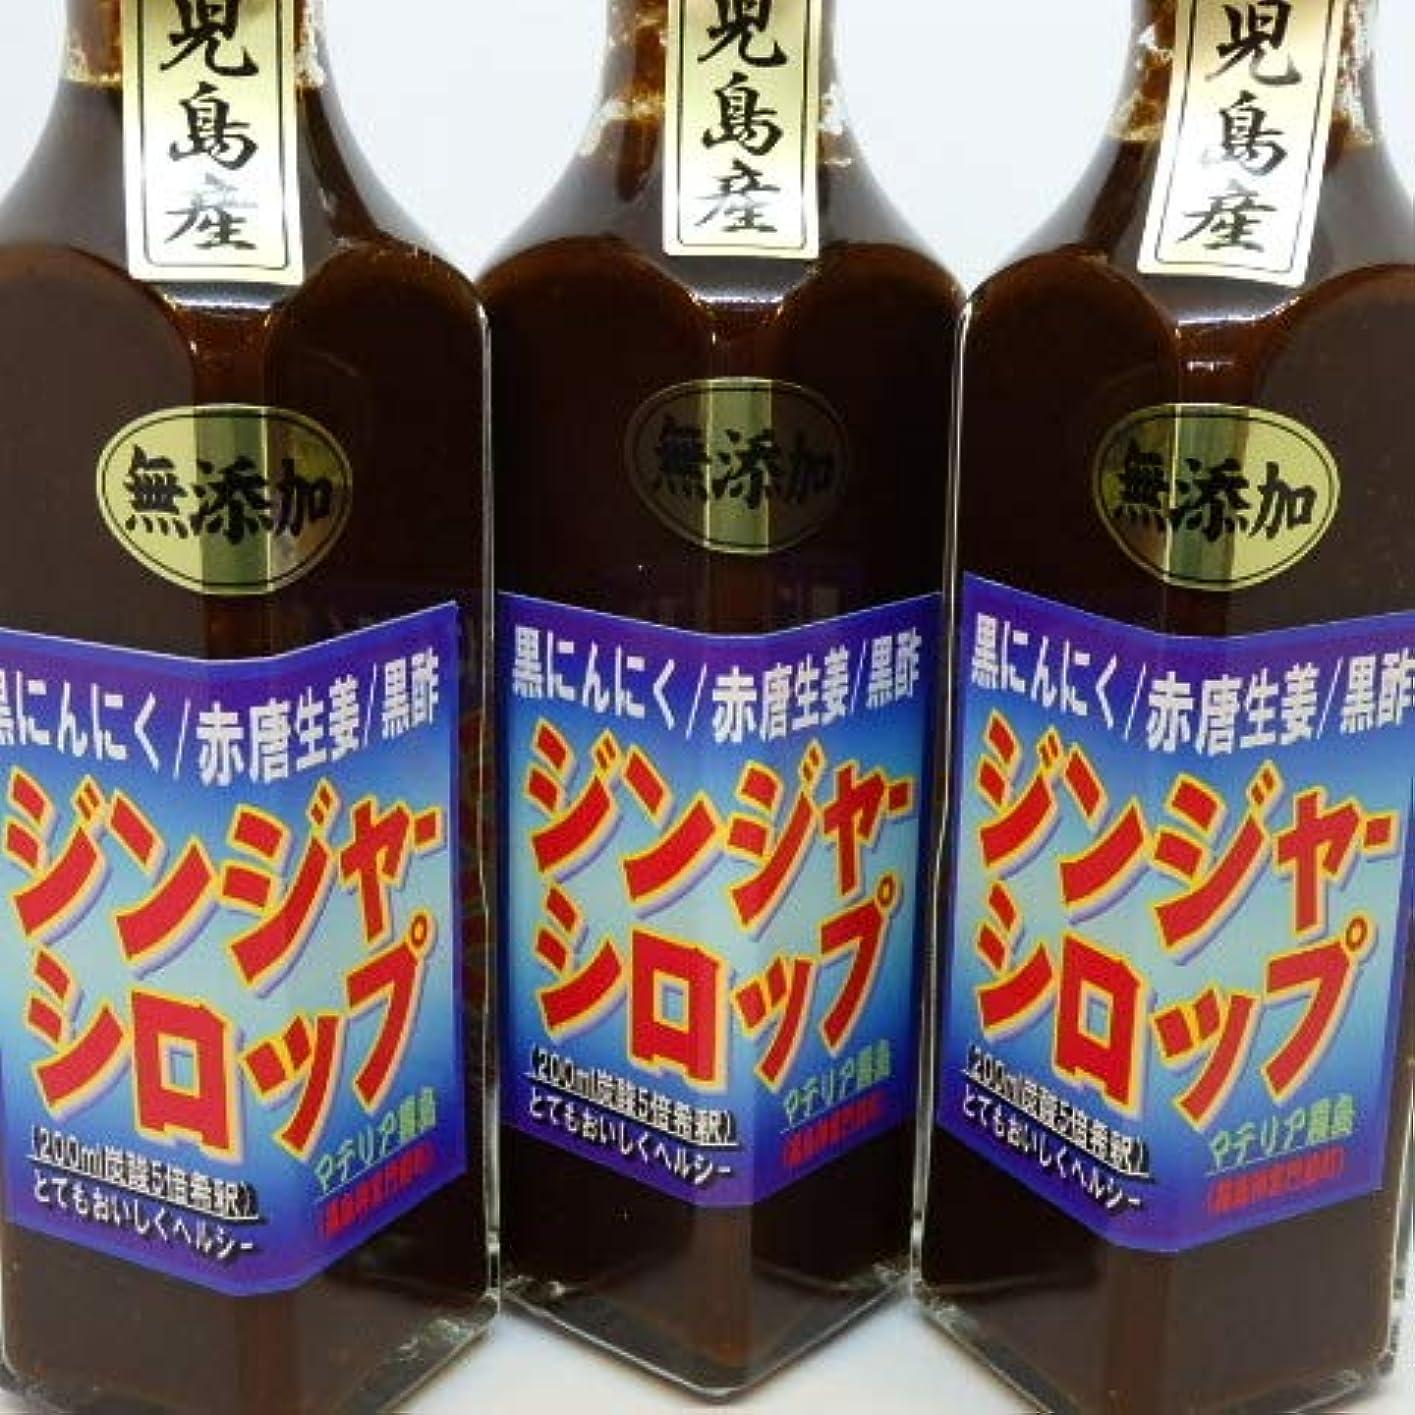 請求可能事務所ホーム無添加健康食品/黒酢黒ジンジャ-/無添加/200ml×3組90日分¥10,800